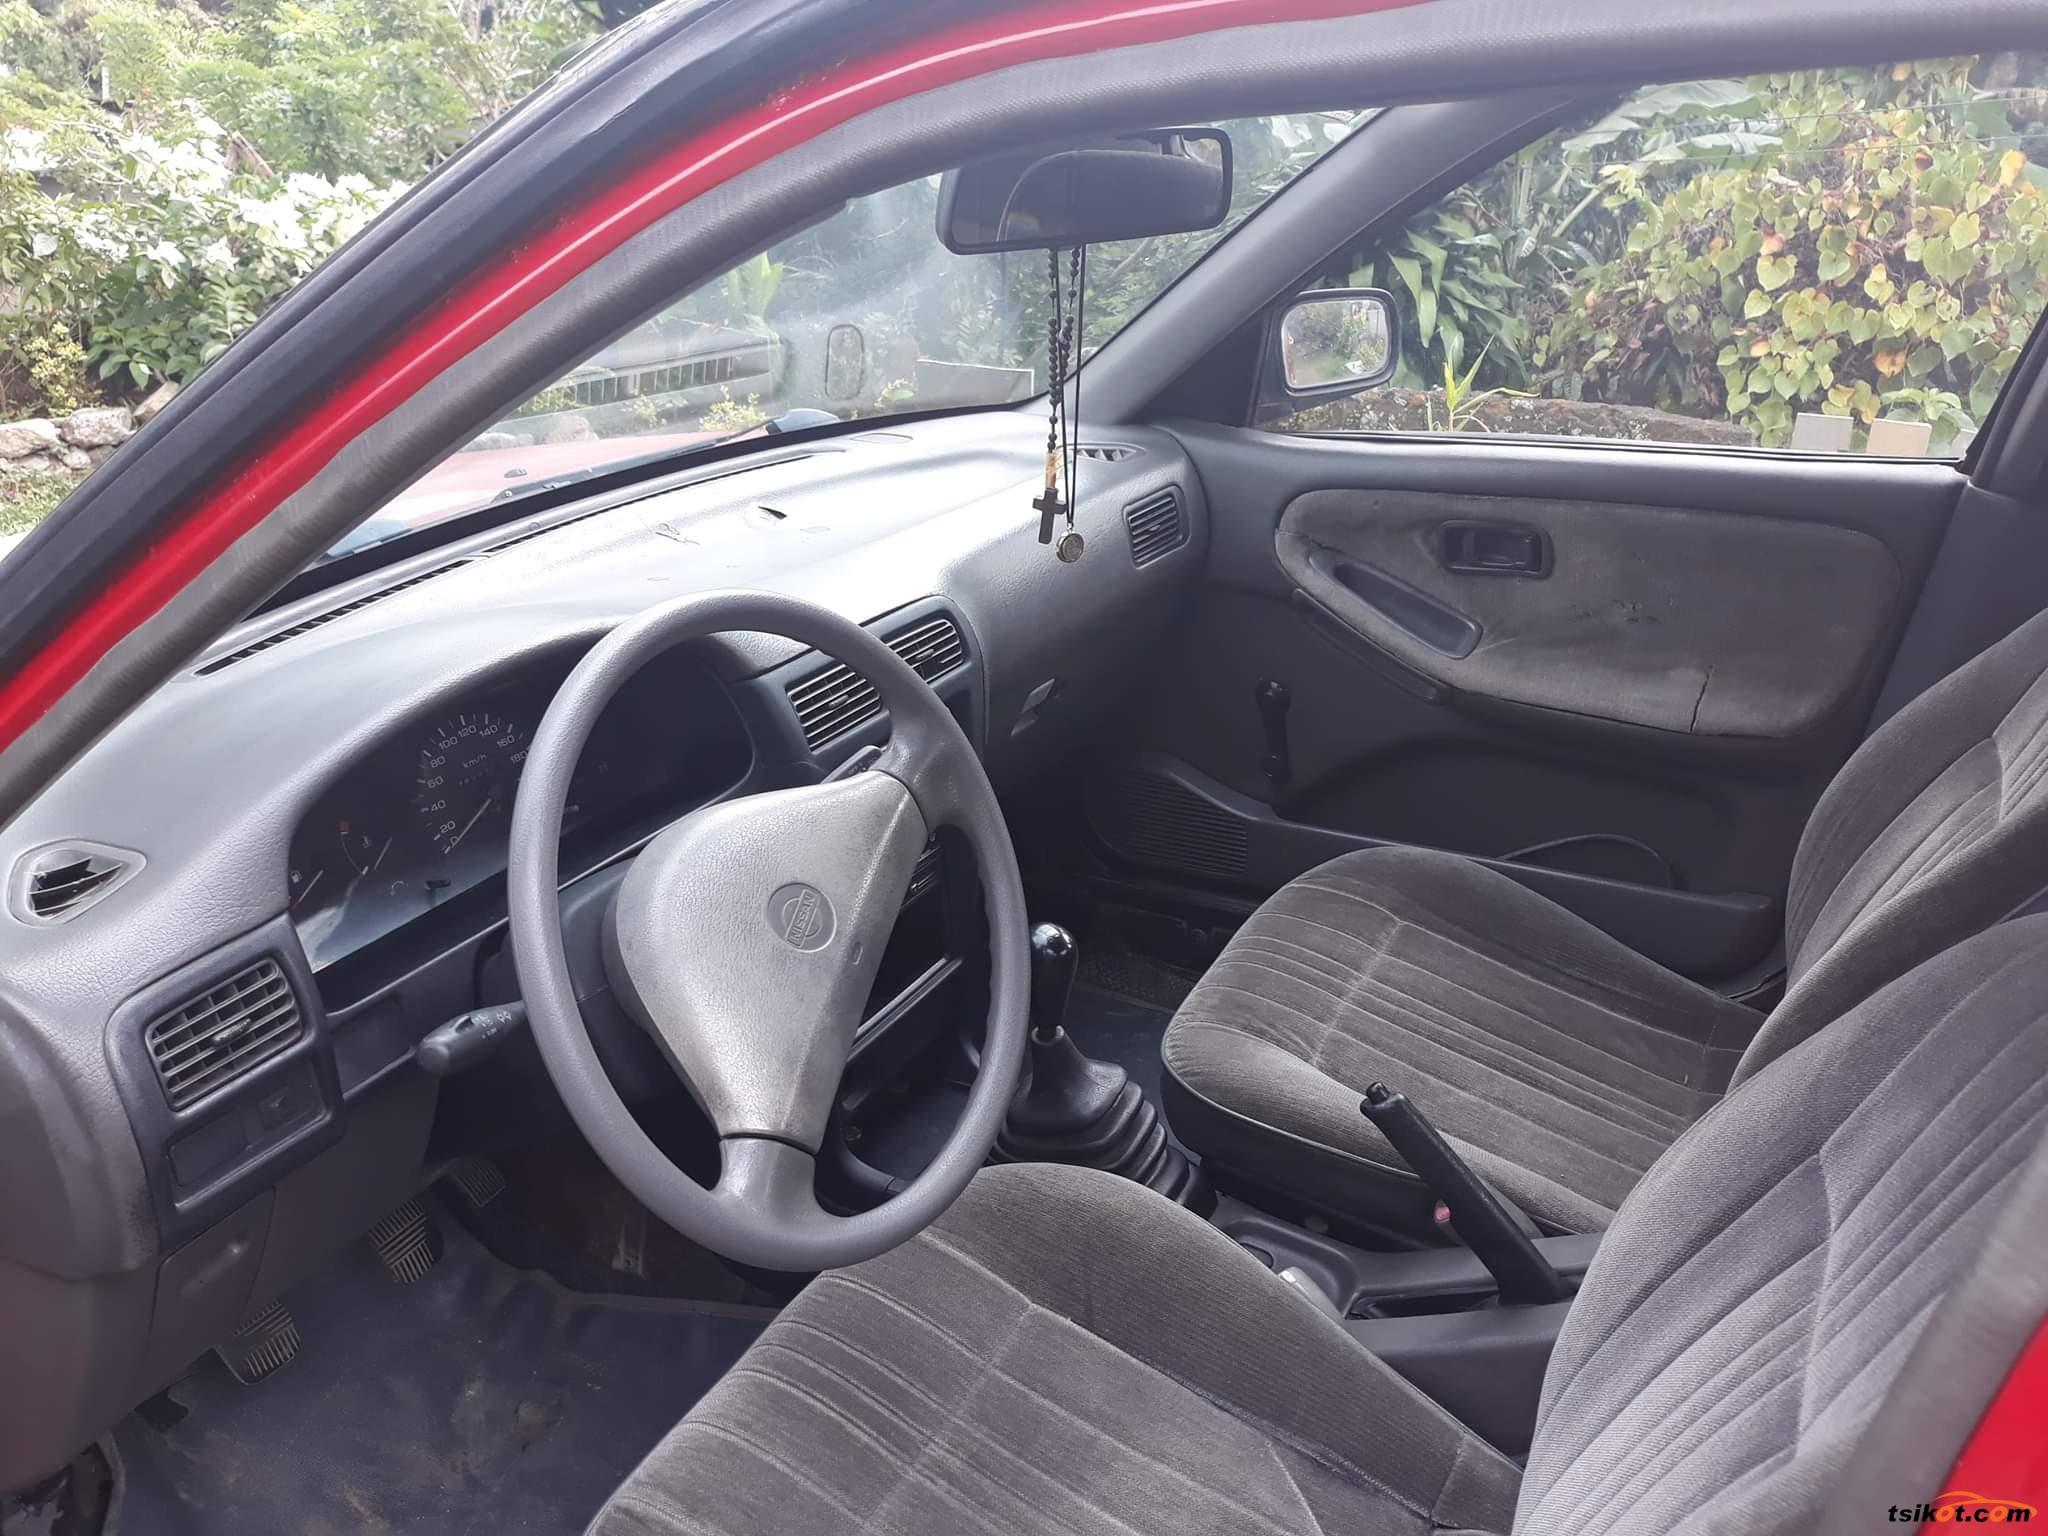 Nissan Sentra 1993 - 3